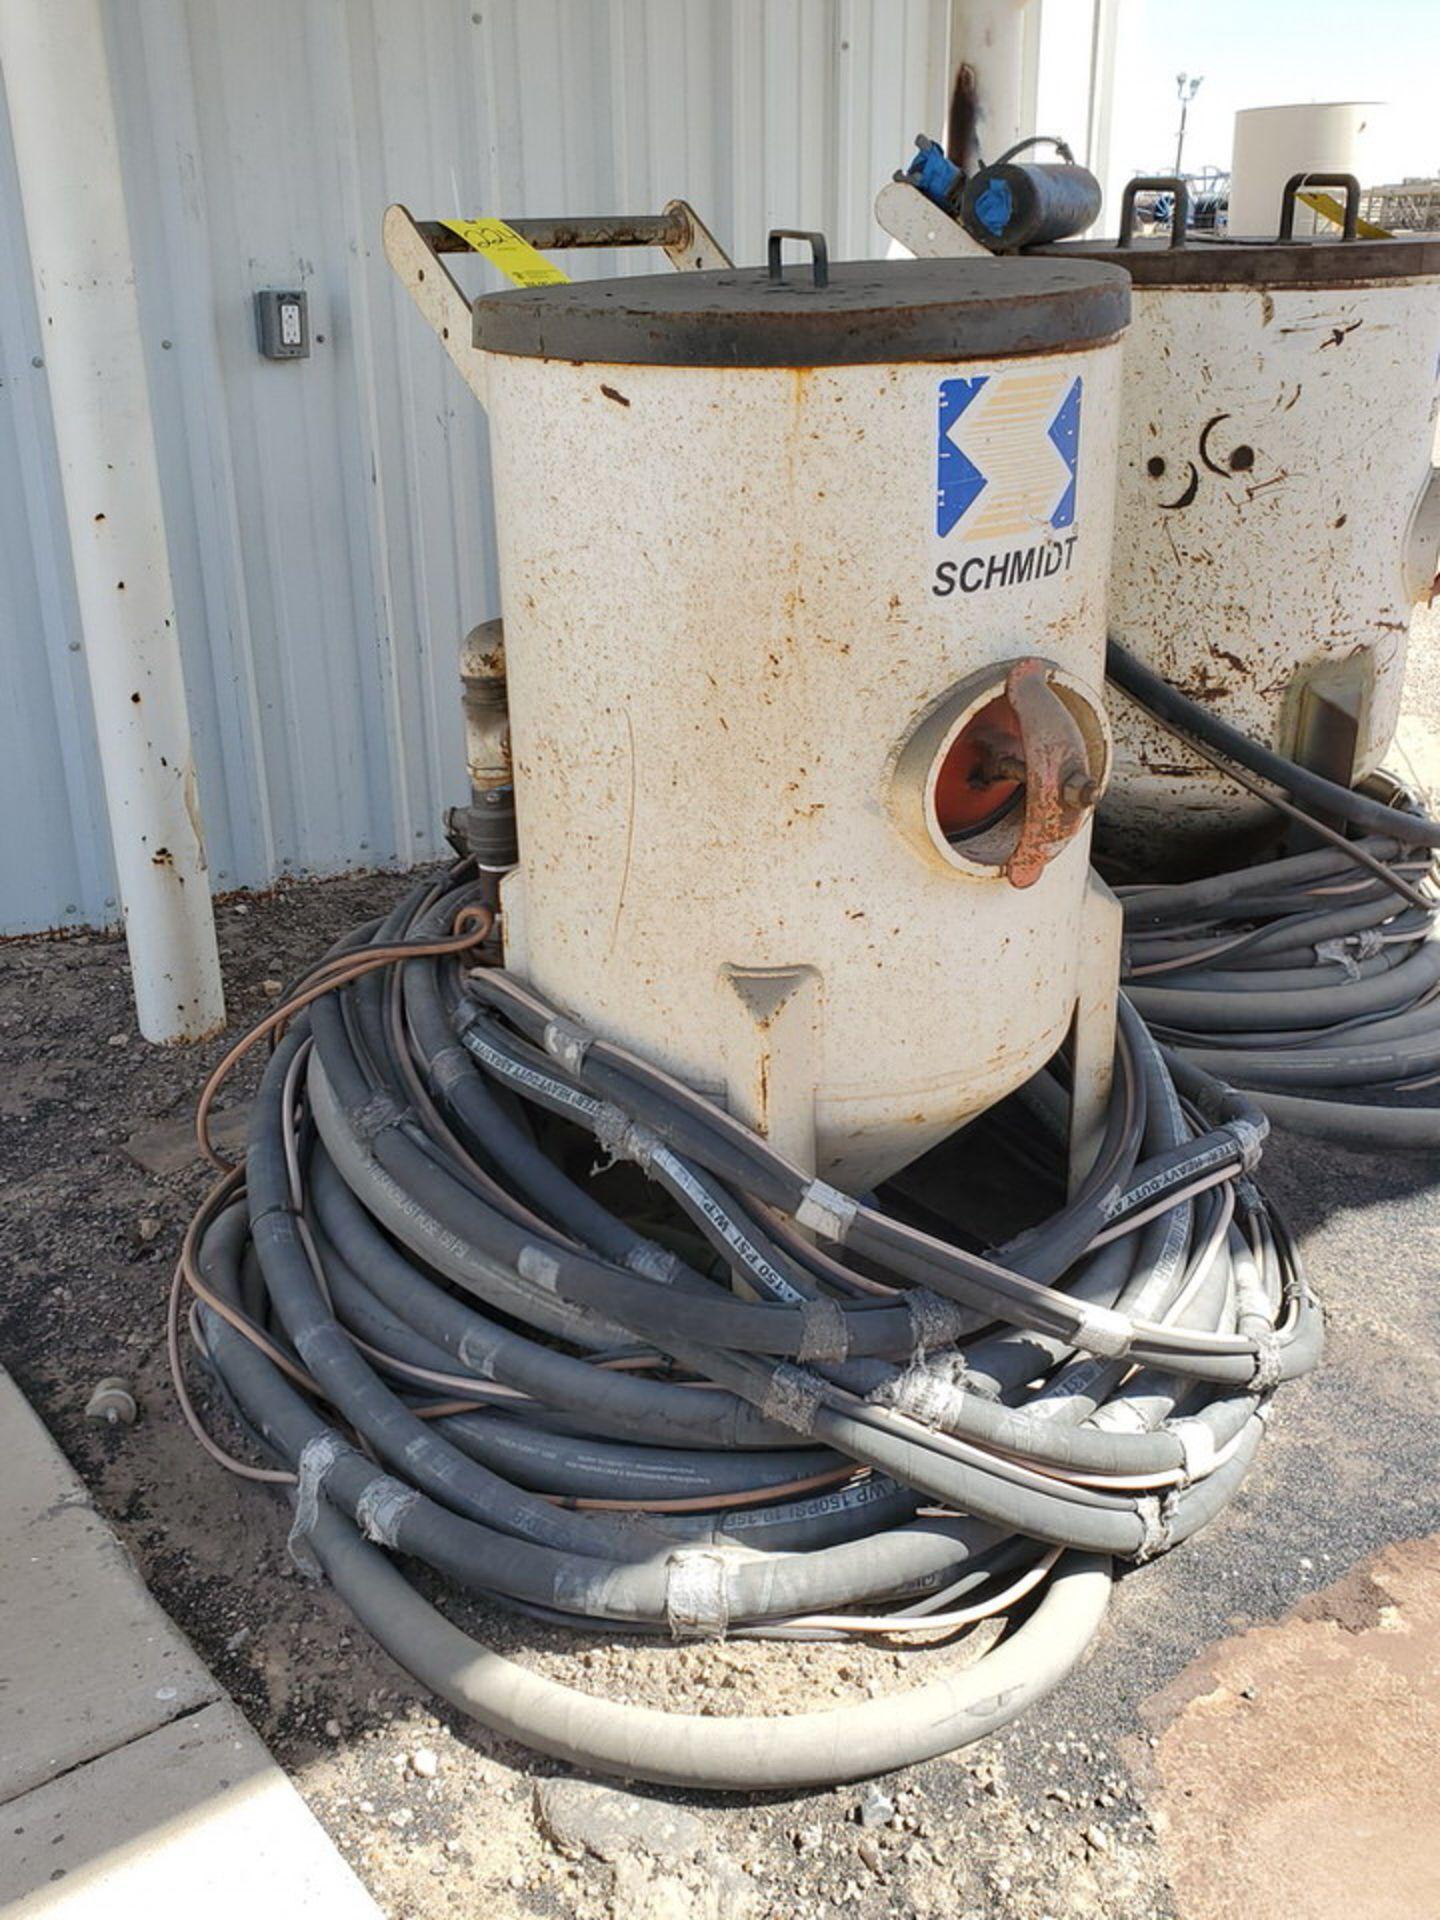 Schmidt 12' Portable Abrasive Sand Blaster Pot 150psi@250F, -20F@150psi; NB# 10649 - Image 3 of 9